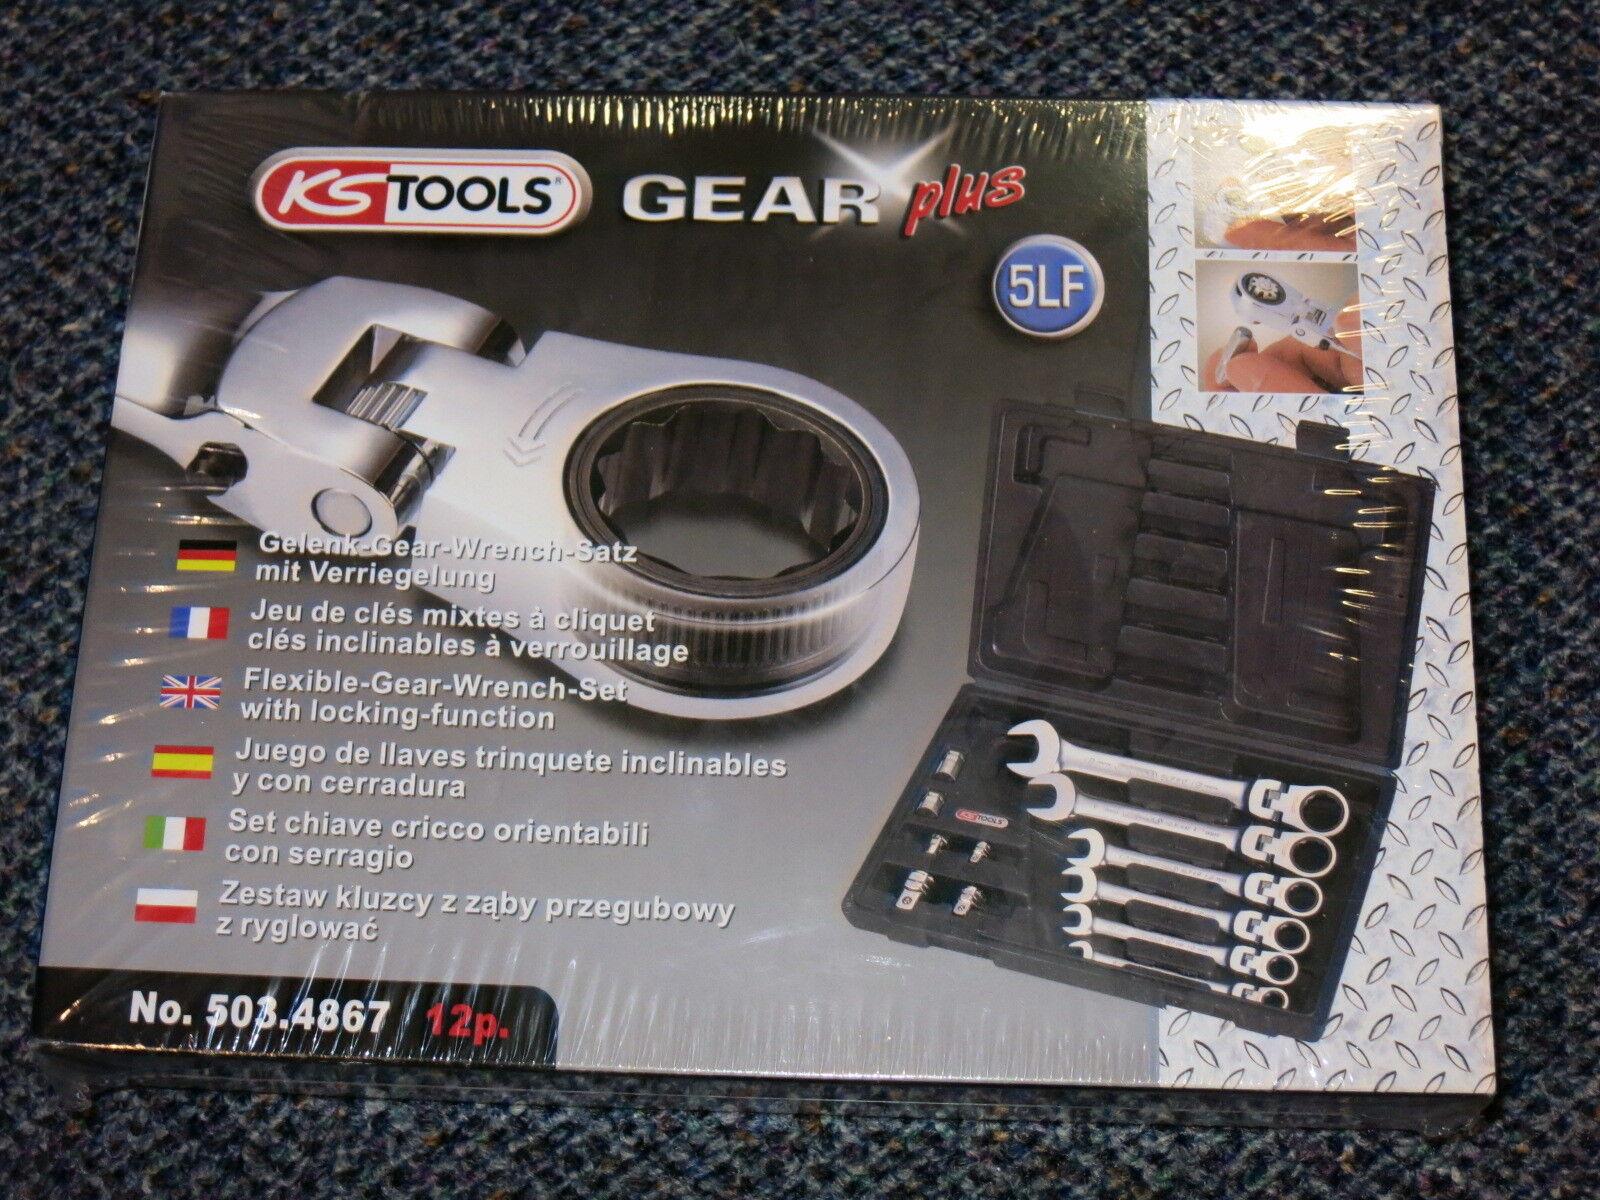 KS Tools 503.4867 GEARplus Gelenk-Ratschenringmaulschlüssel-Satz, 12-tlg.